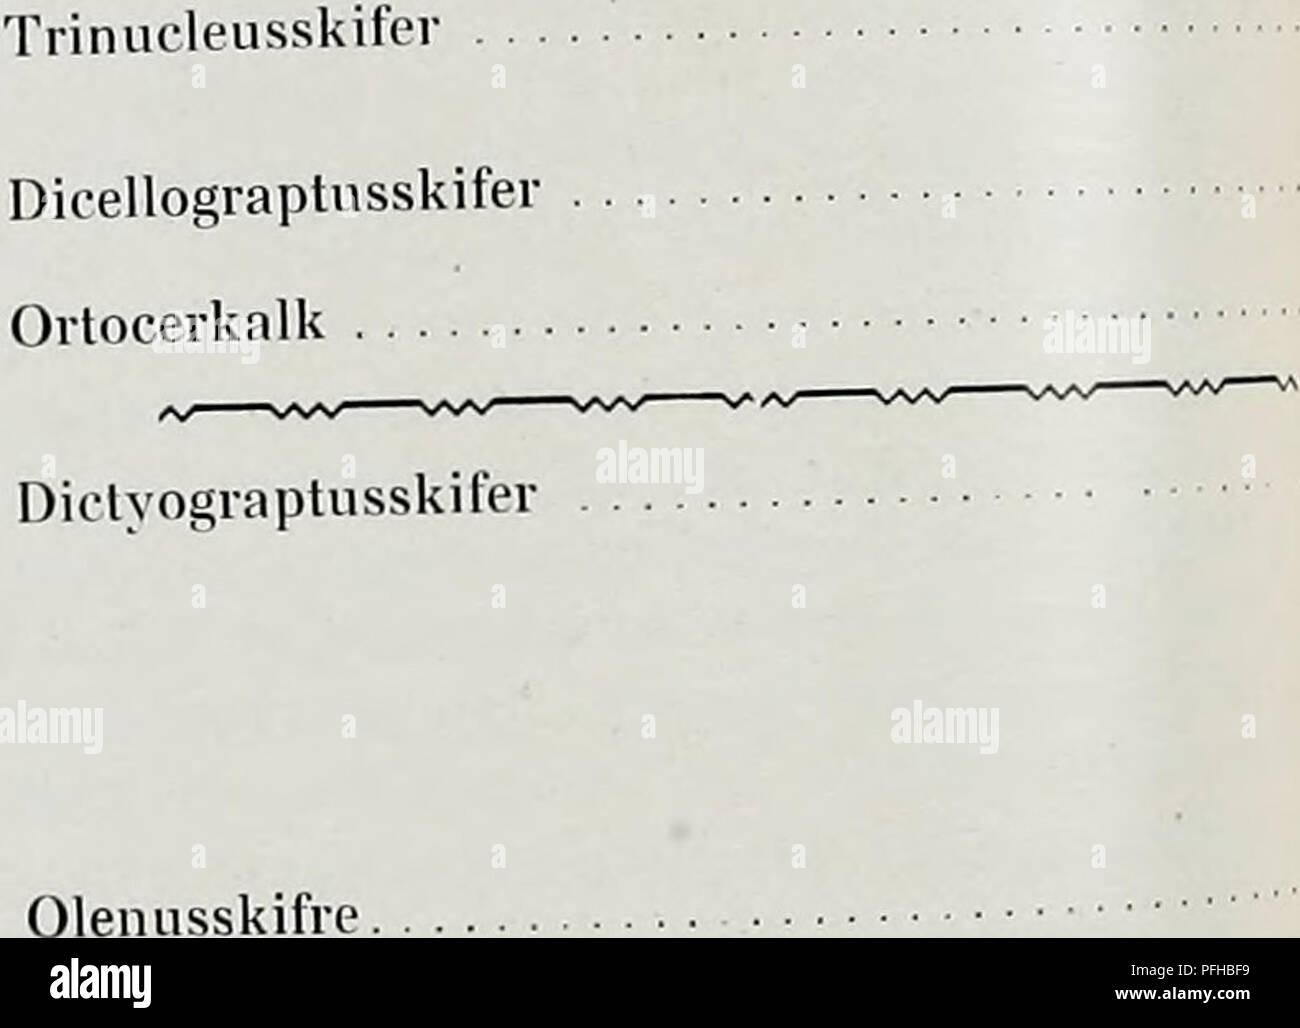 . Danmarks geologiske undersøgelse. Geology. Oversigt over Bornholms Sil Lagrækken ikke blottet. Lagrækken ikke tilstrækkelig blottet. Lakune. Lagrækken ikke tilstrækkelig blottet. Lakune. Cyrtograptusskifer Rastritesskifer. Paradoxidesskil're Grønne Skifre . Nexø Sandsten rrienlignet med Skaanes. med Monogr. Riecartønensis _ Cyrtogr. Murchizoni. . — Lapworthi. . _ Monogr. 9 Spiralis — Cyrtogr. Grayiæ one med Monogr. runcinatus . . Sedgivicki — Cephalogr. cometa — Petalogr. folium — Monogr. triangulatus . — — cyphus - Diplogr. acuminatus . . lie med Stauroeephalus clauifrons — Ampyx Porllocki  - Stock Image